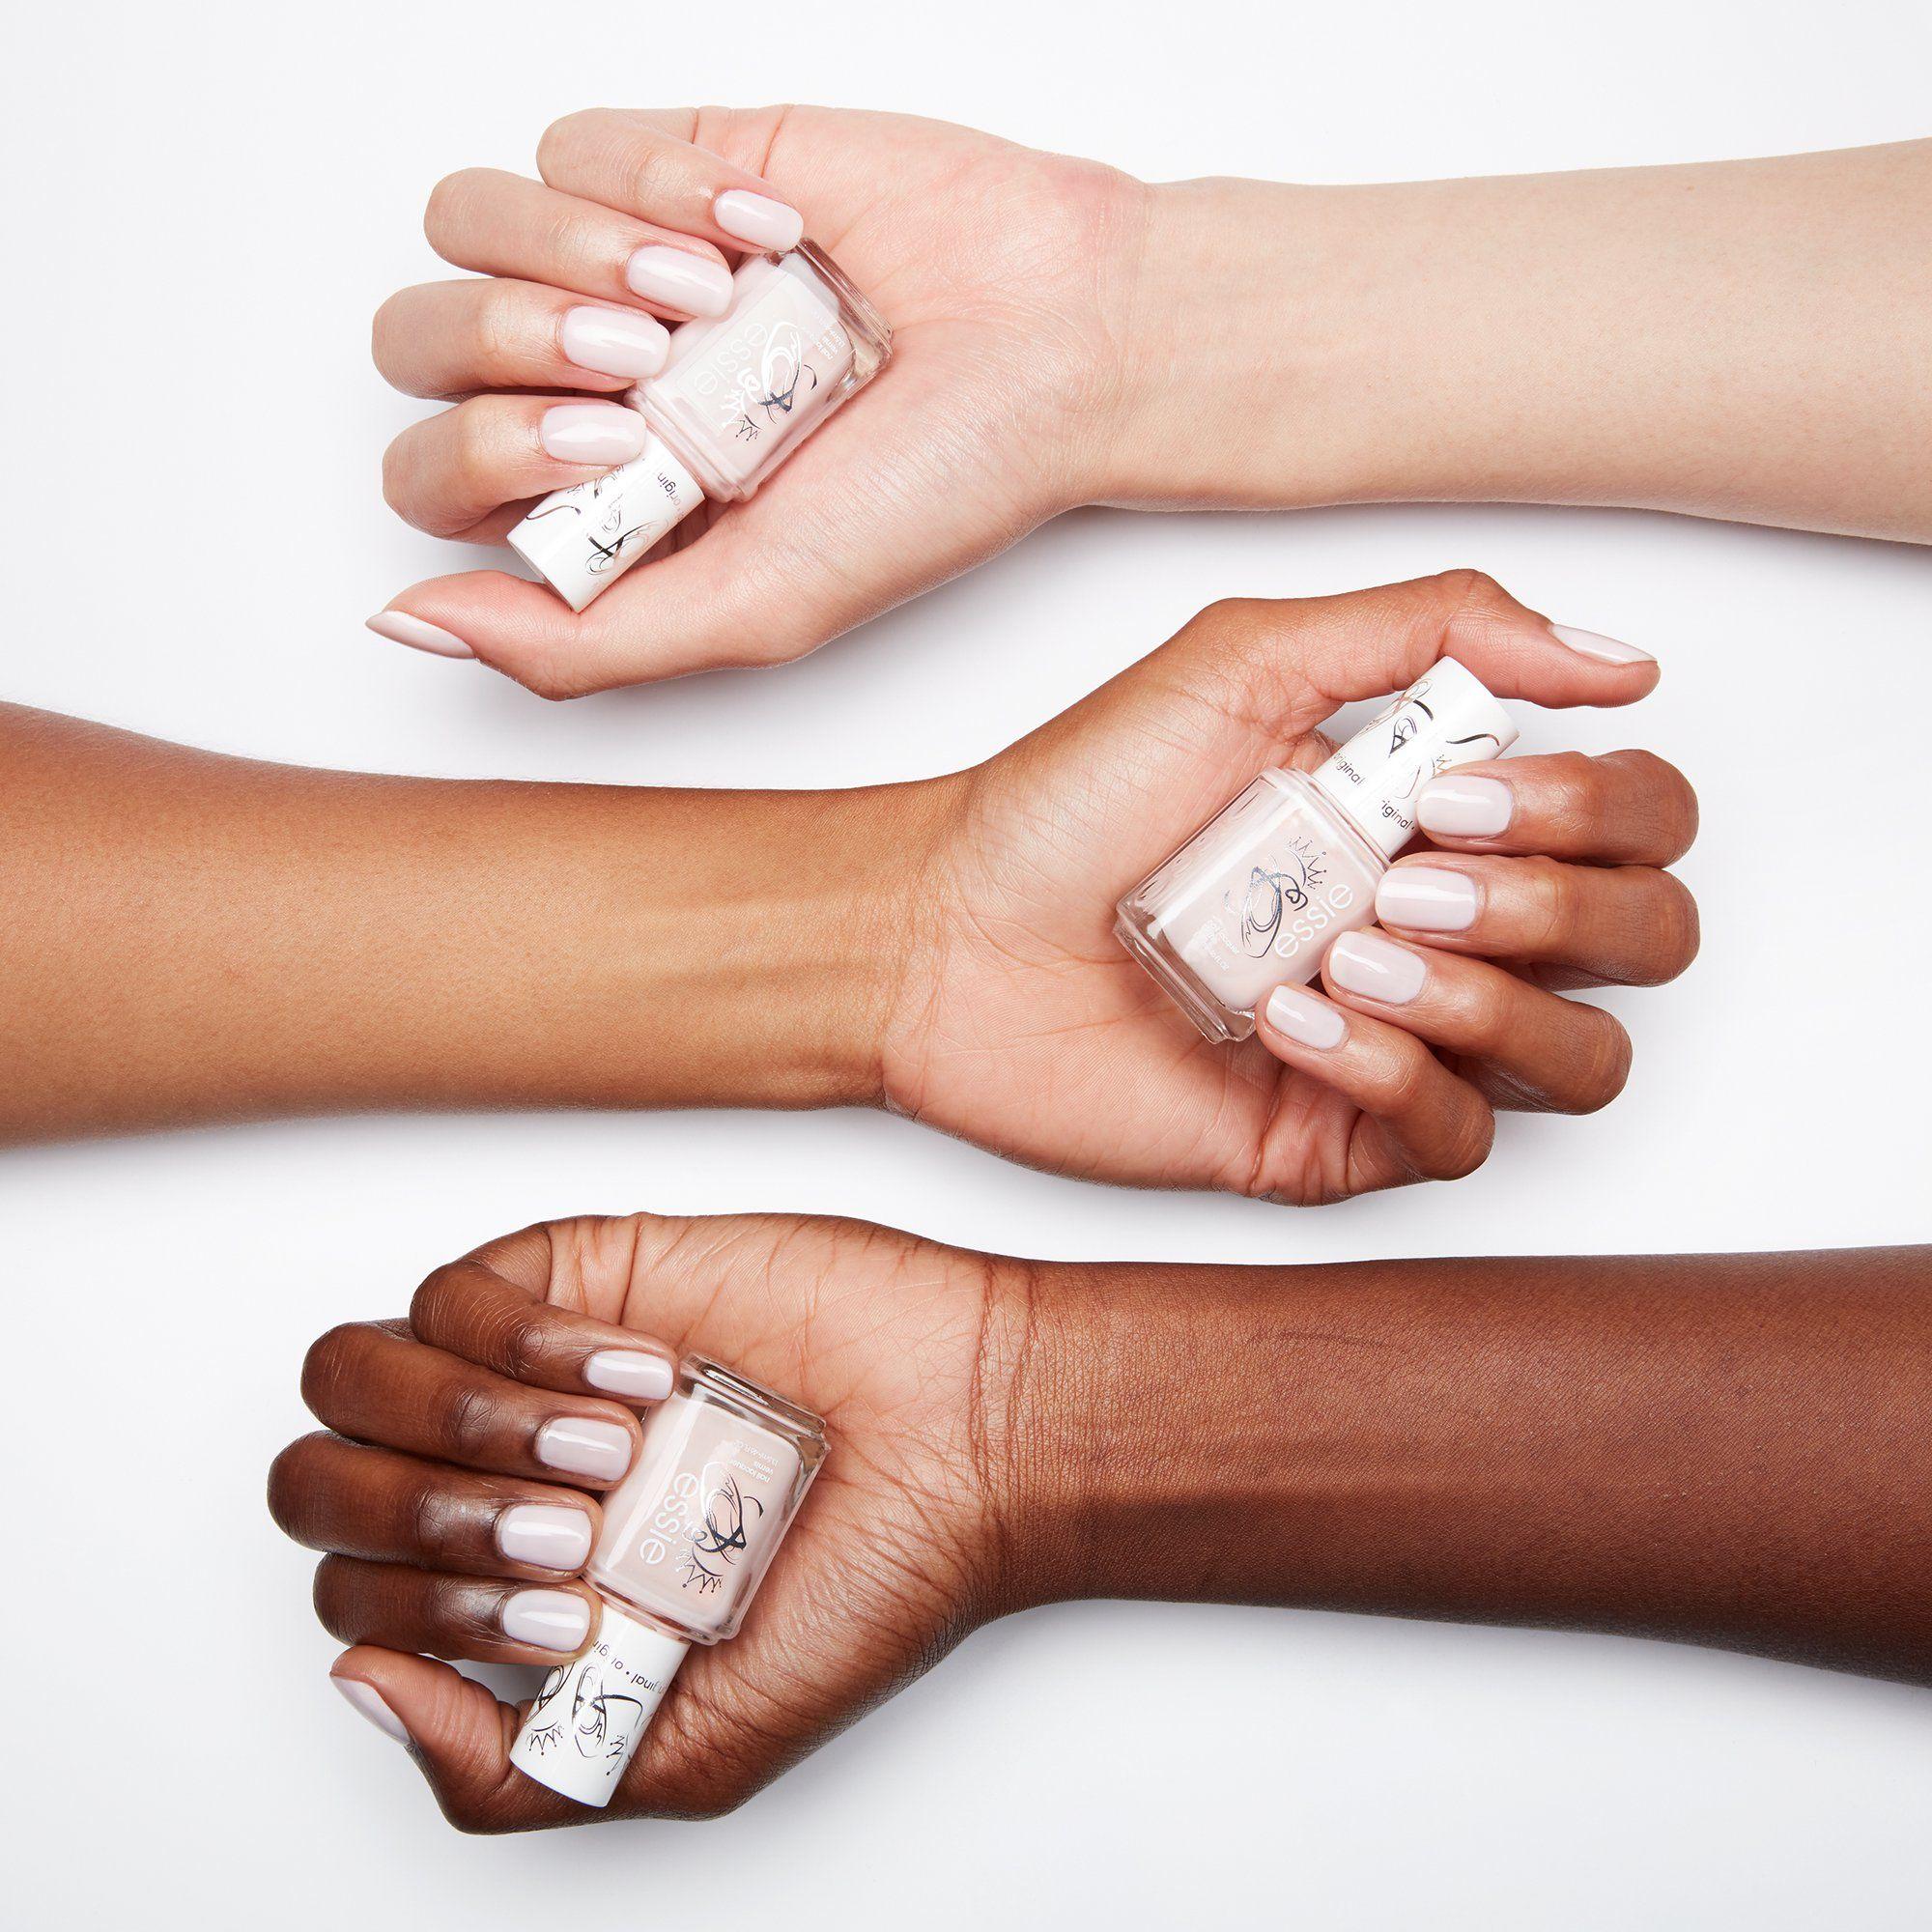 essie nail polish (pinks), ballet slippers, 0.46 fl. oz. - Walmart.com - Walmart.com